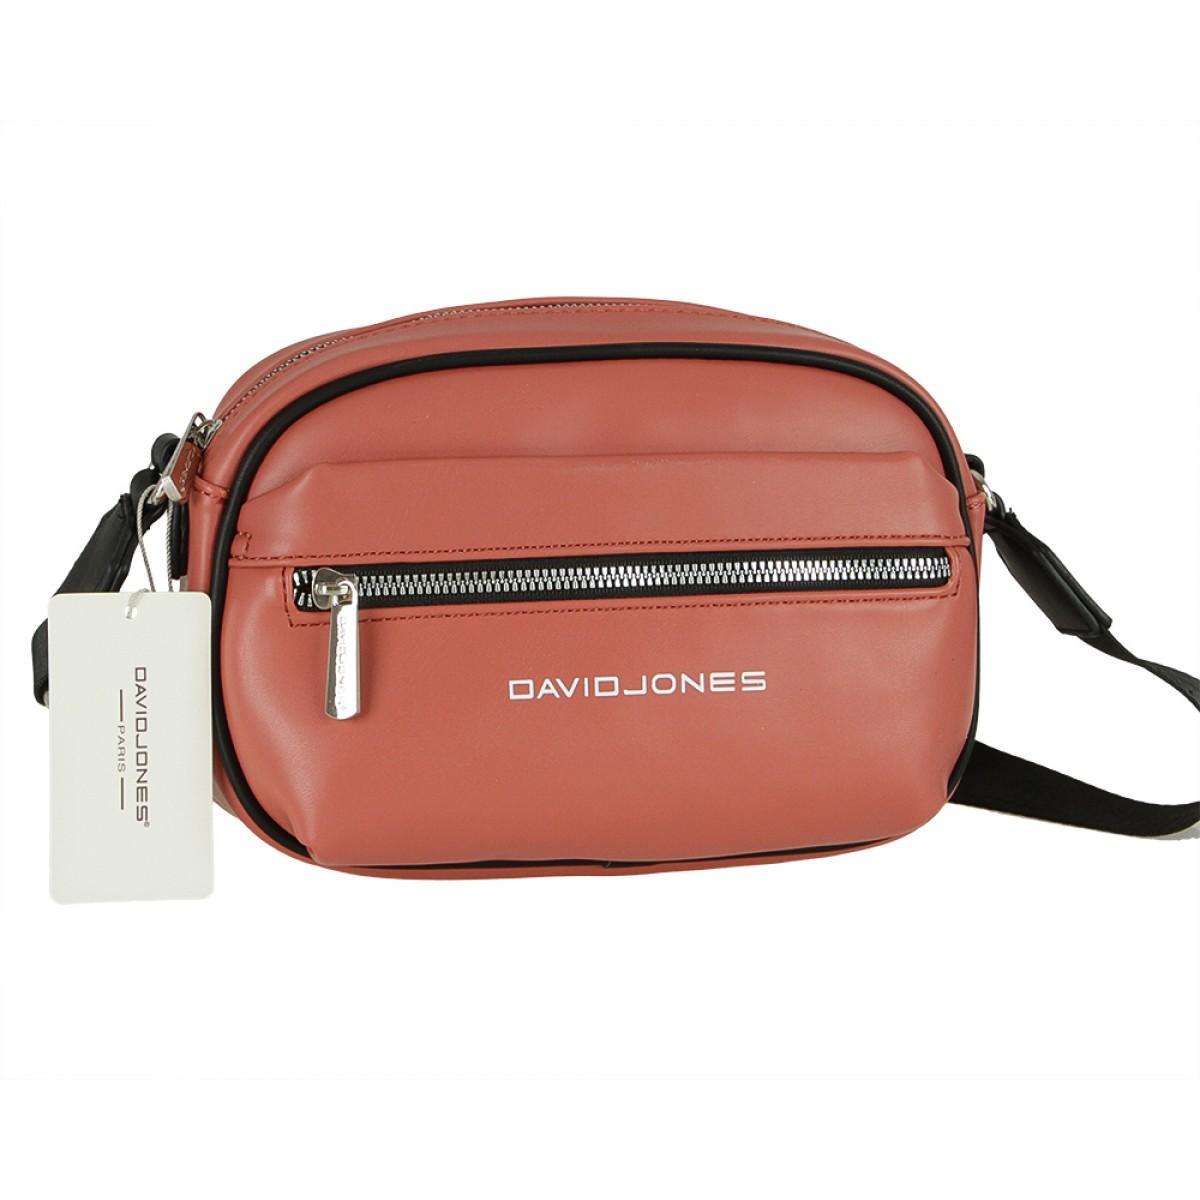 Жіноча сумка David Jones 6208-1 BRICK RED